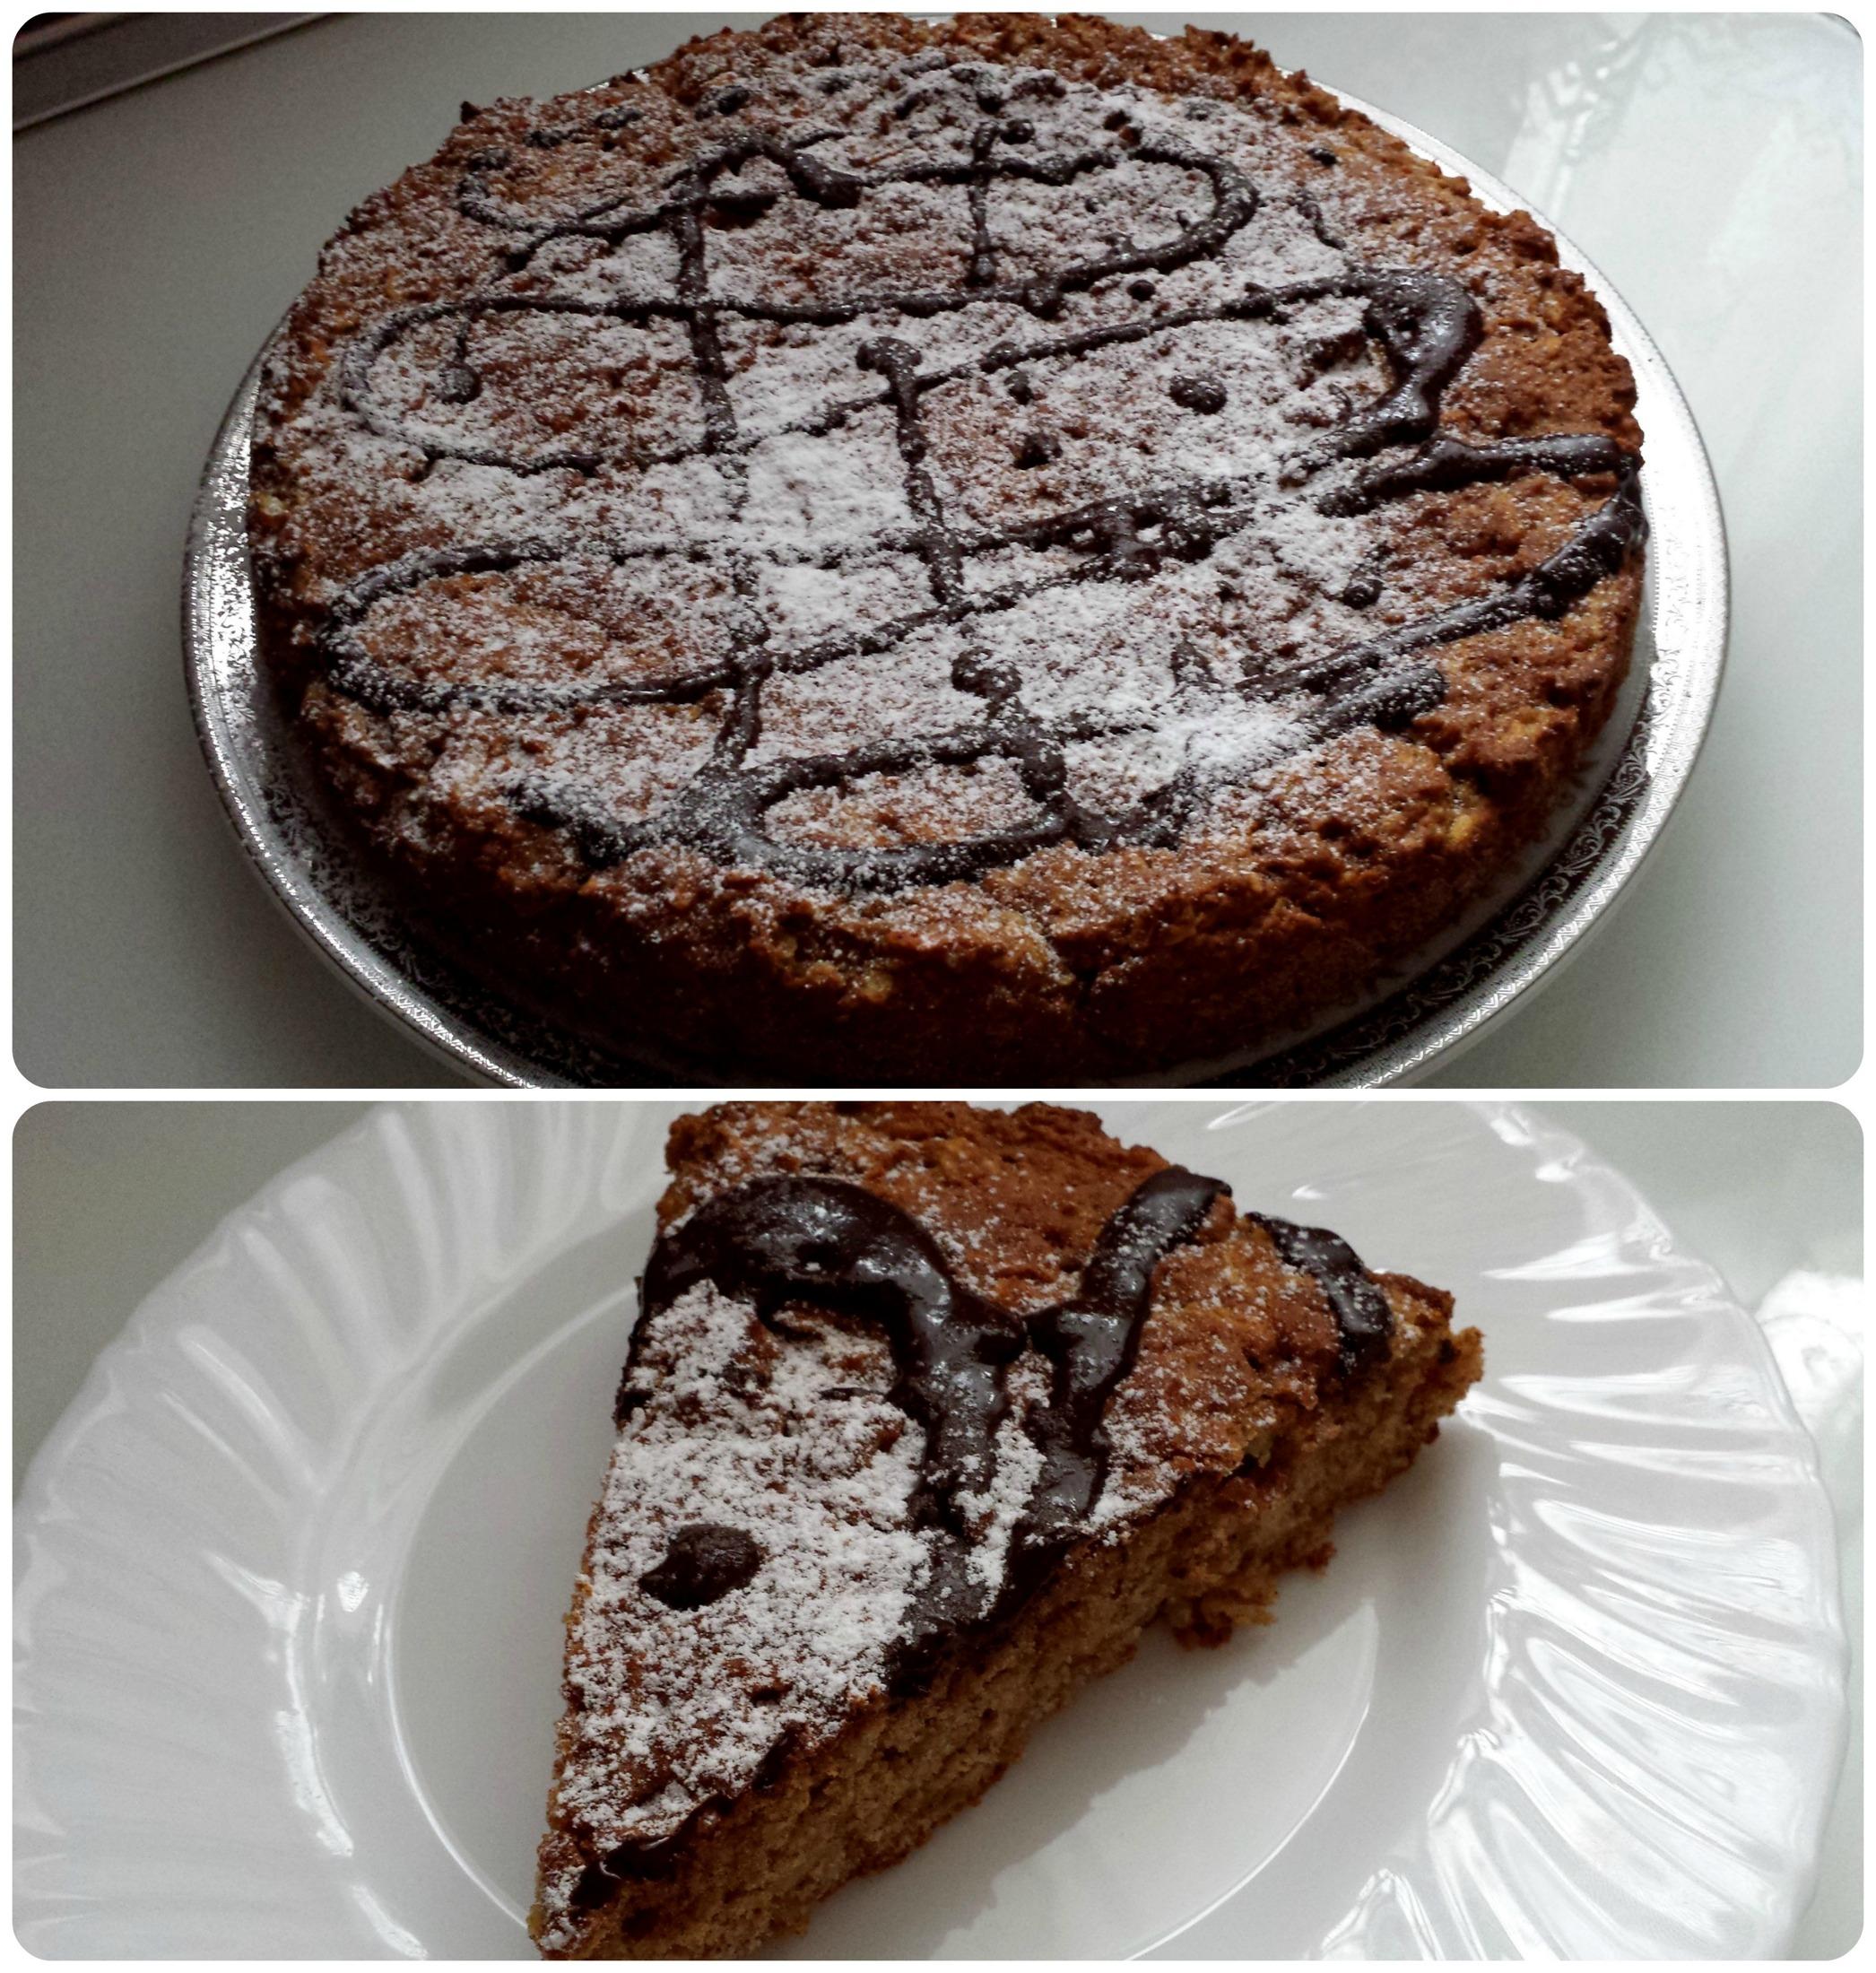 Fotografie receptu: Jablkovo-skořicový koláč bez vajec a mléka